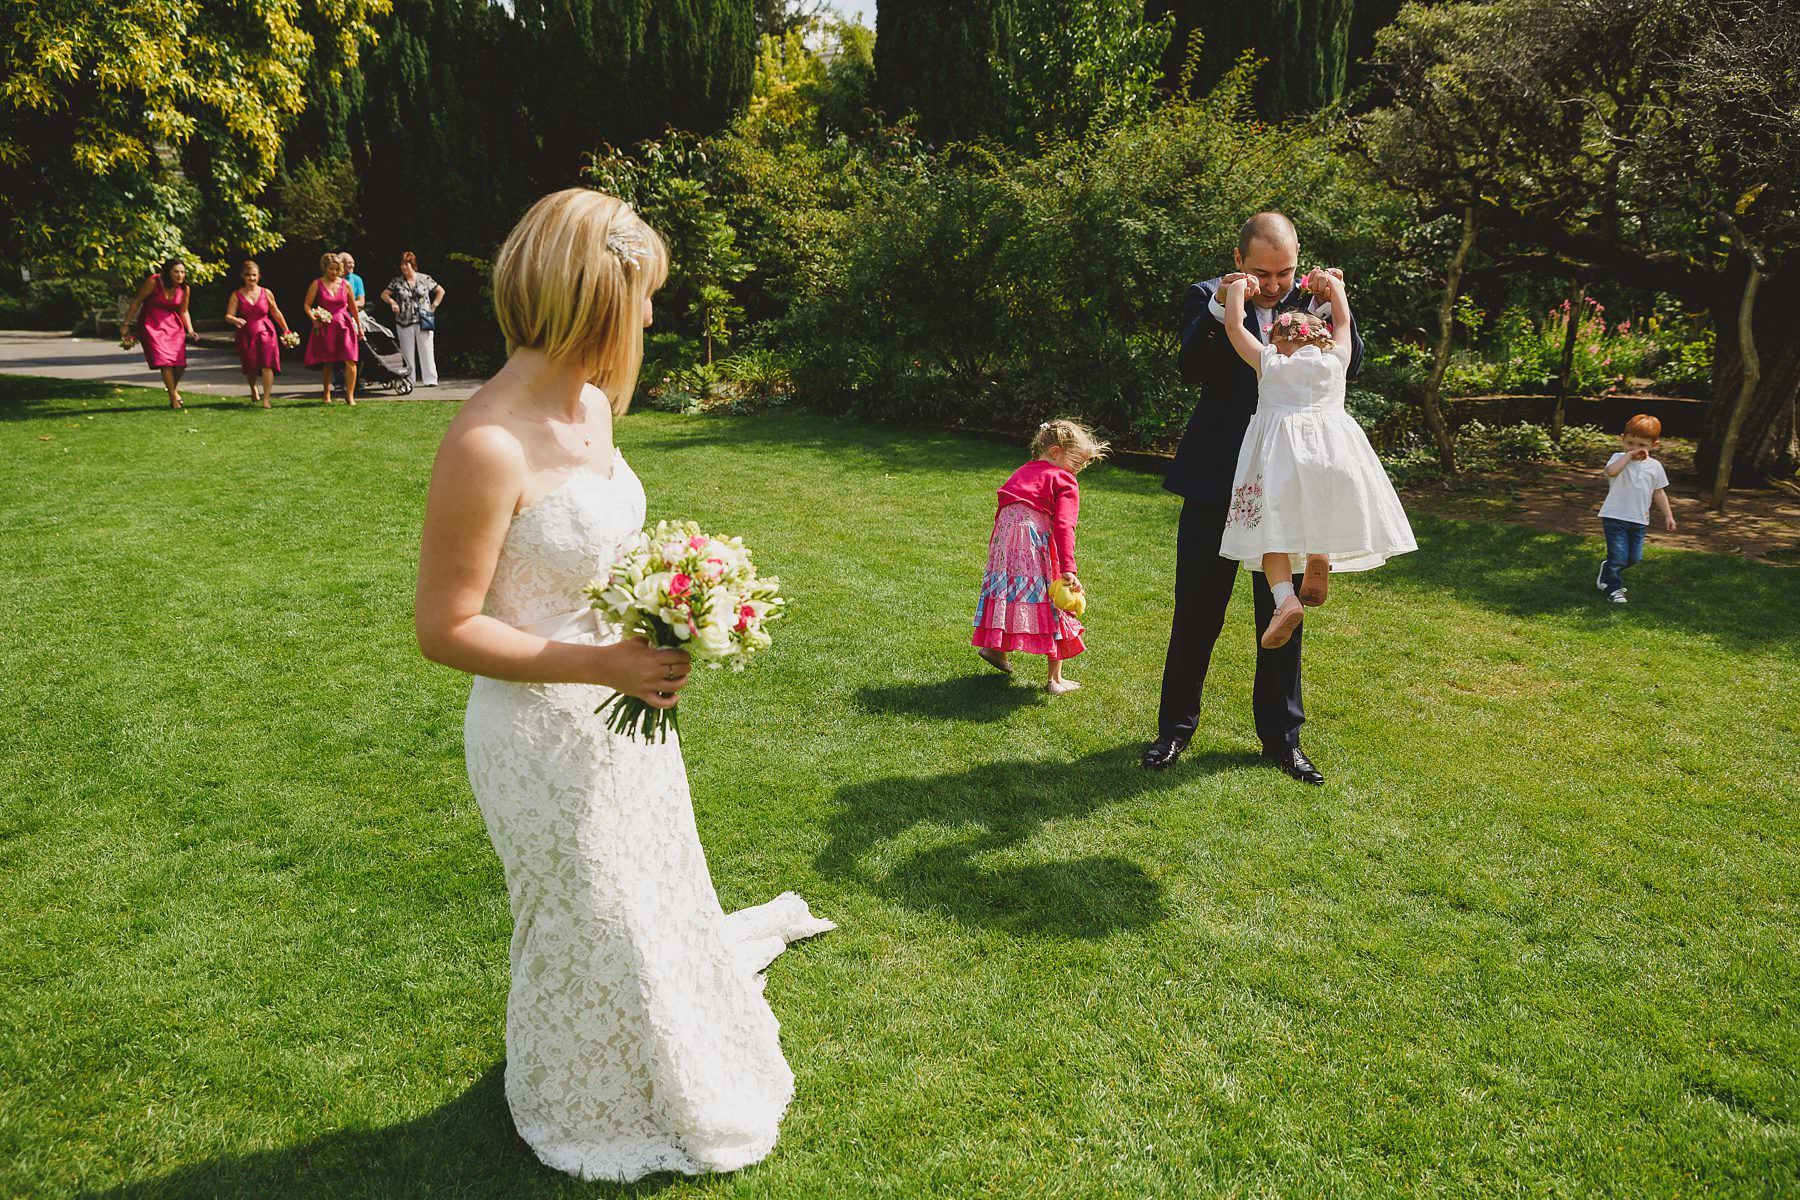 weddings-at-bristol-zoo-007